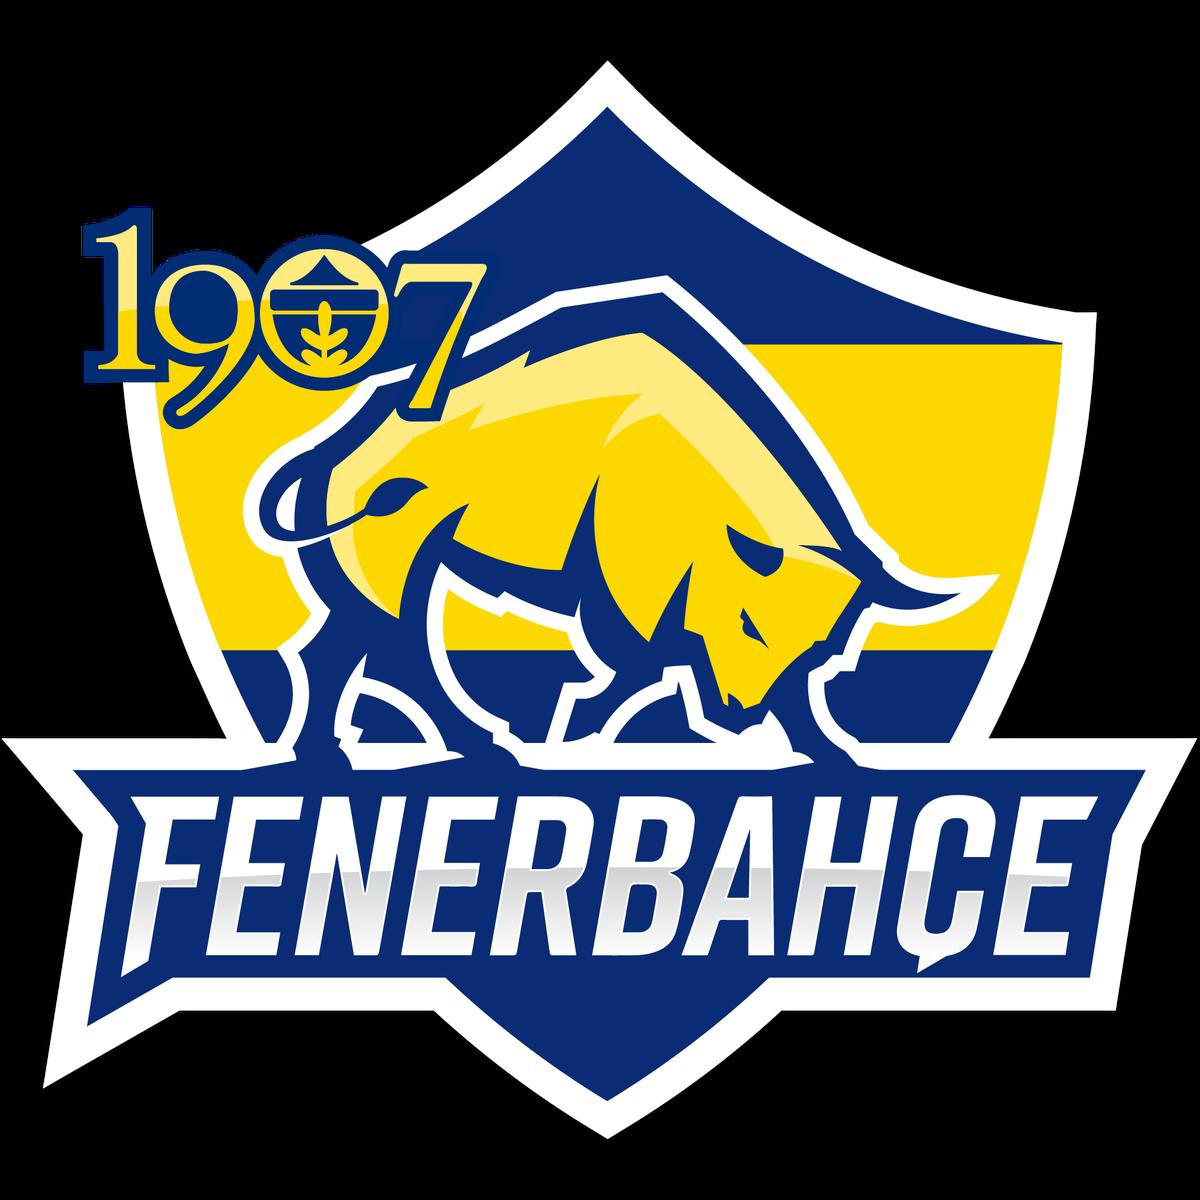 1907 Fenerbahçe Esports League of Legends